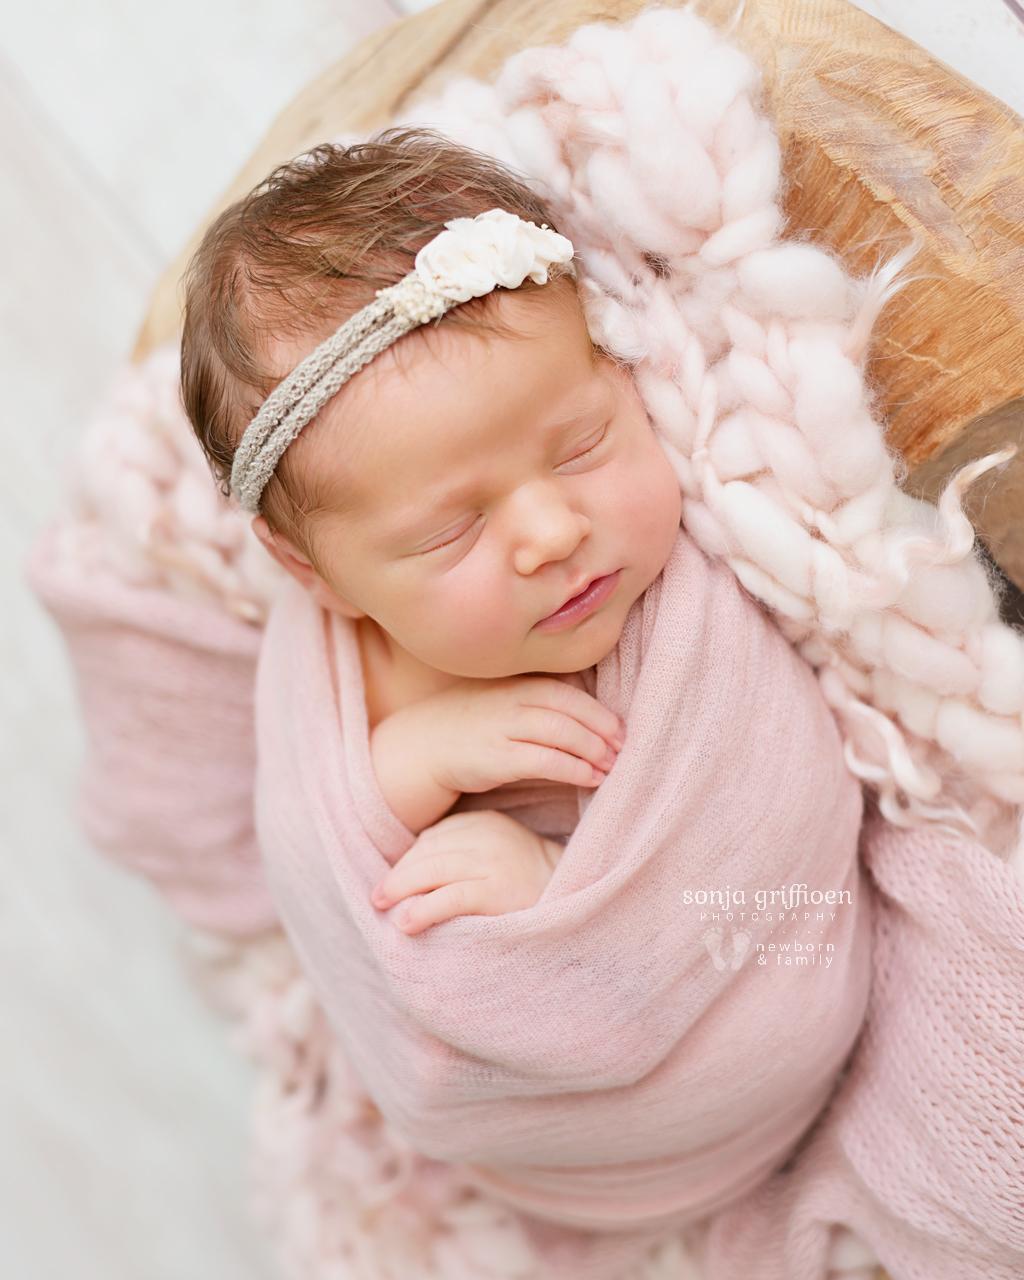 Cleo-Newborn-Brisbane-Newborn-Photographer-Sonja-Griffioen-03b.jpg